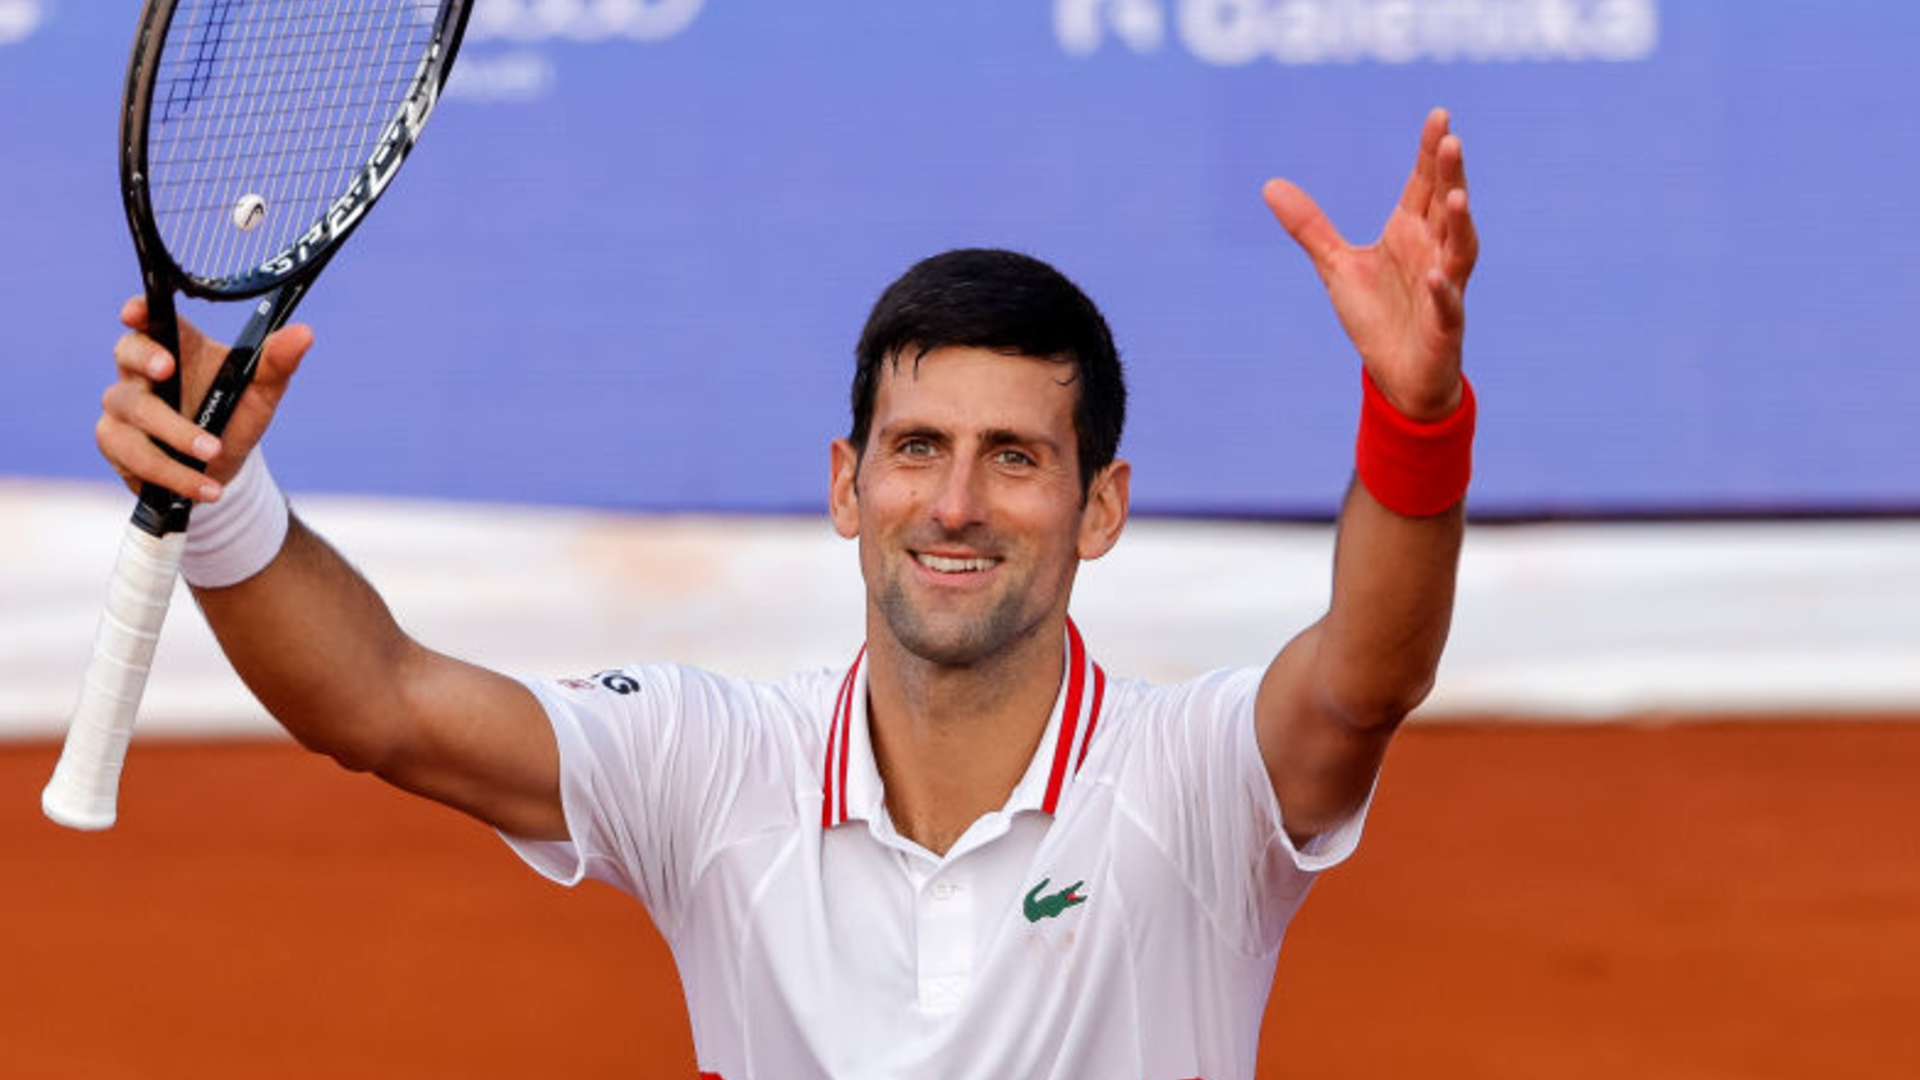 Djokovic celebration